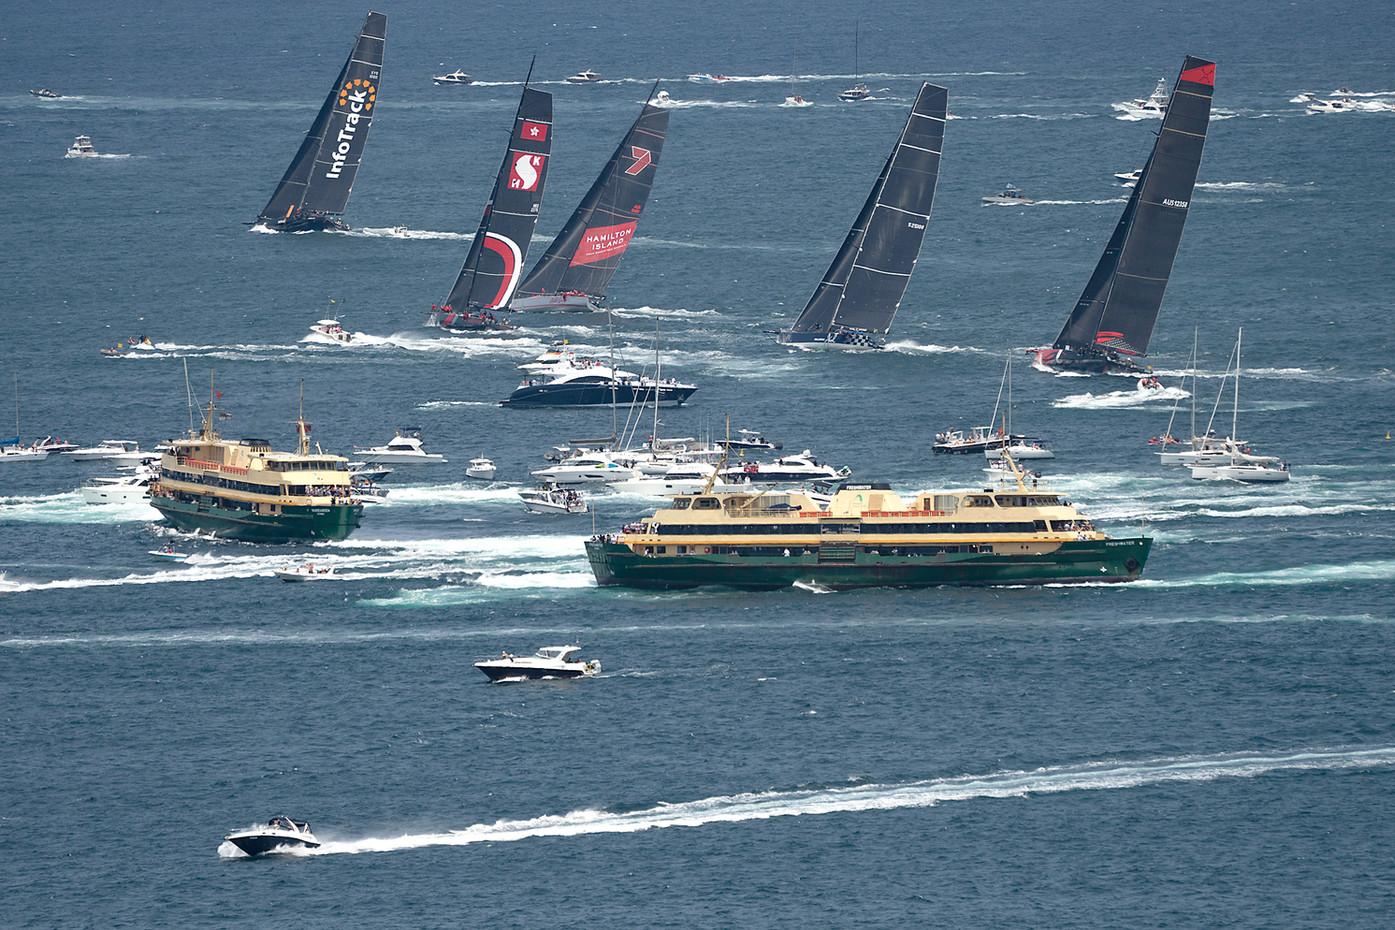 Sydney to Hobart yacht race, Australia